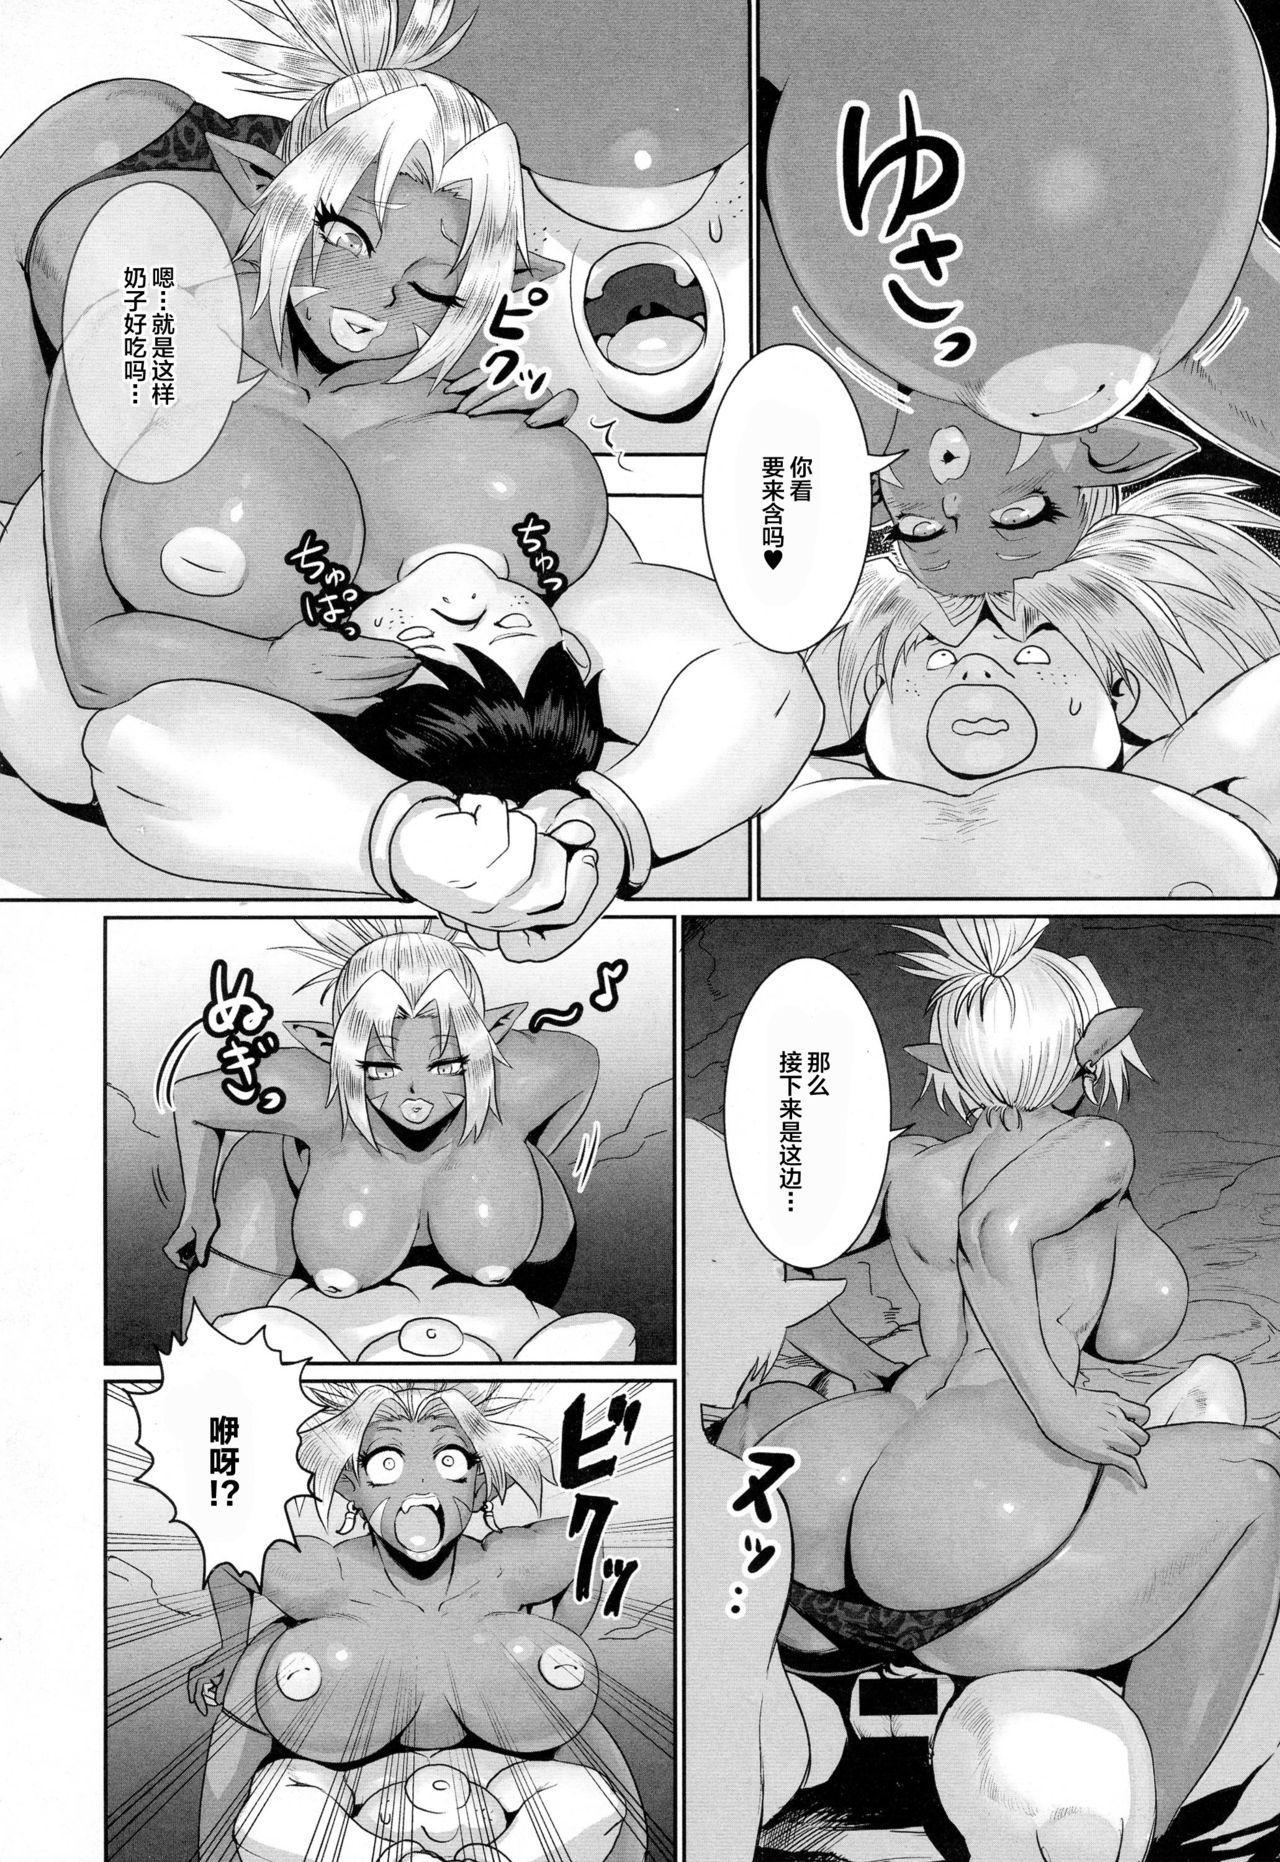 Orc Musume wa Ikemen ga Osuki | 雌性半兽人喜欢帅哥 5